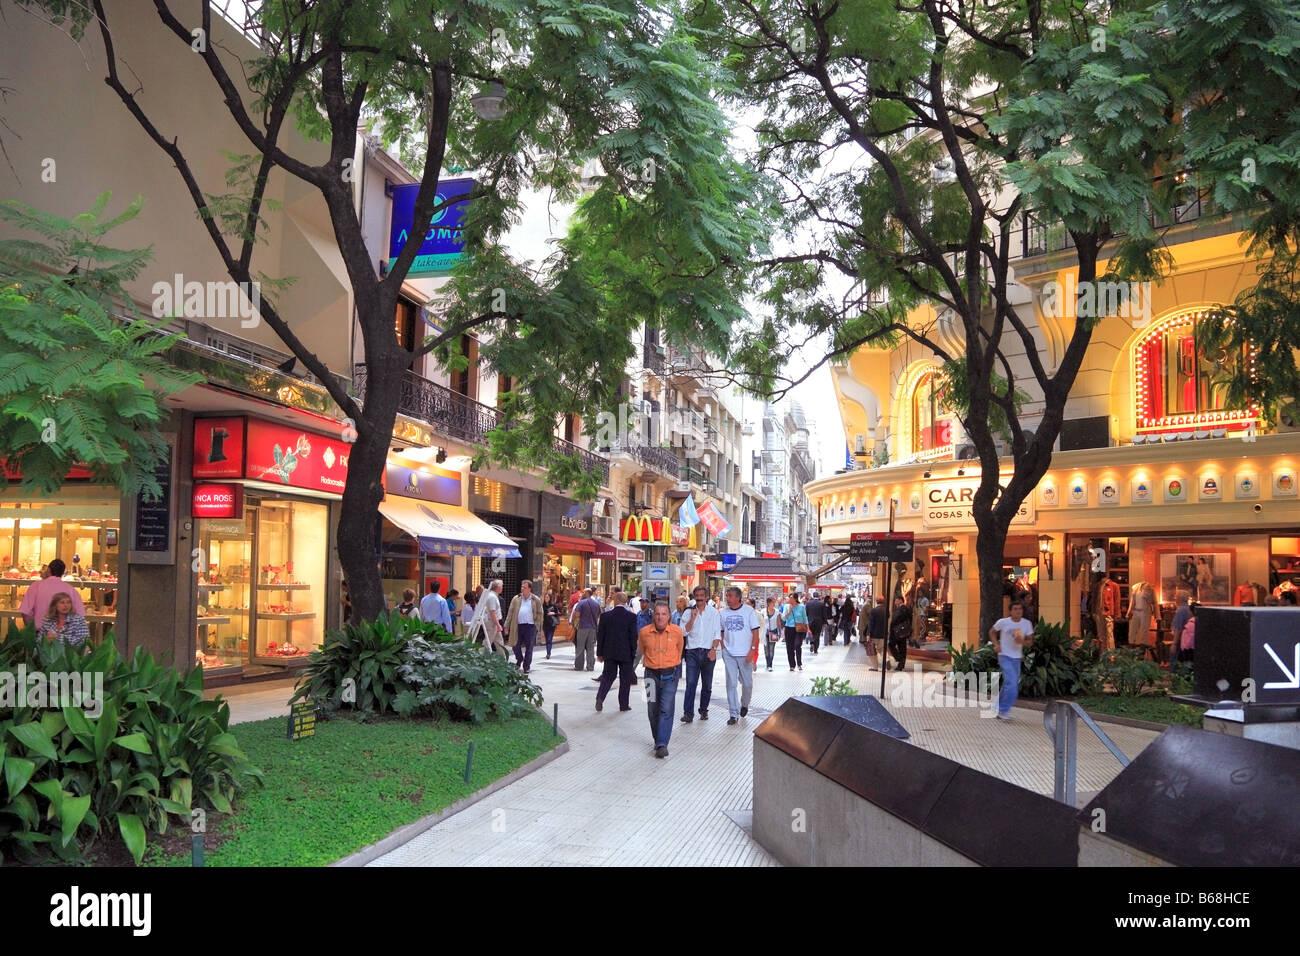 Florida pedestrian Street, near Plaza San martin Square. Retiro, Buenos Aires, Argentina. - Stock Image